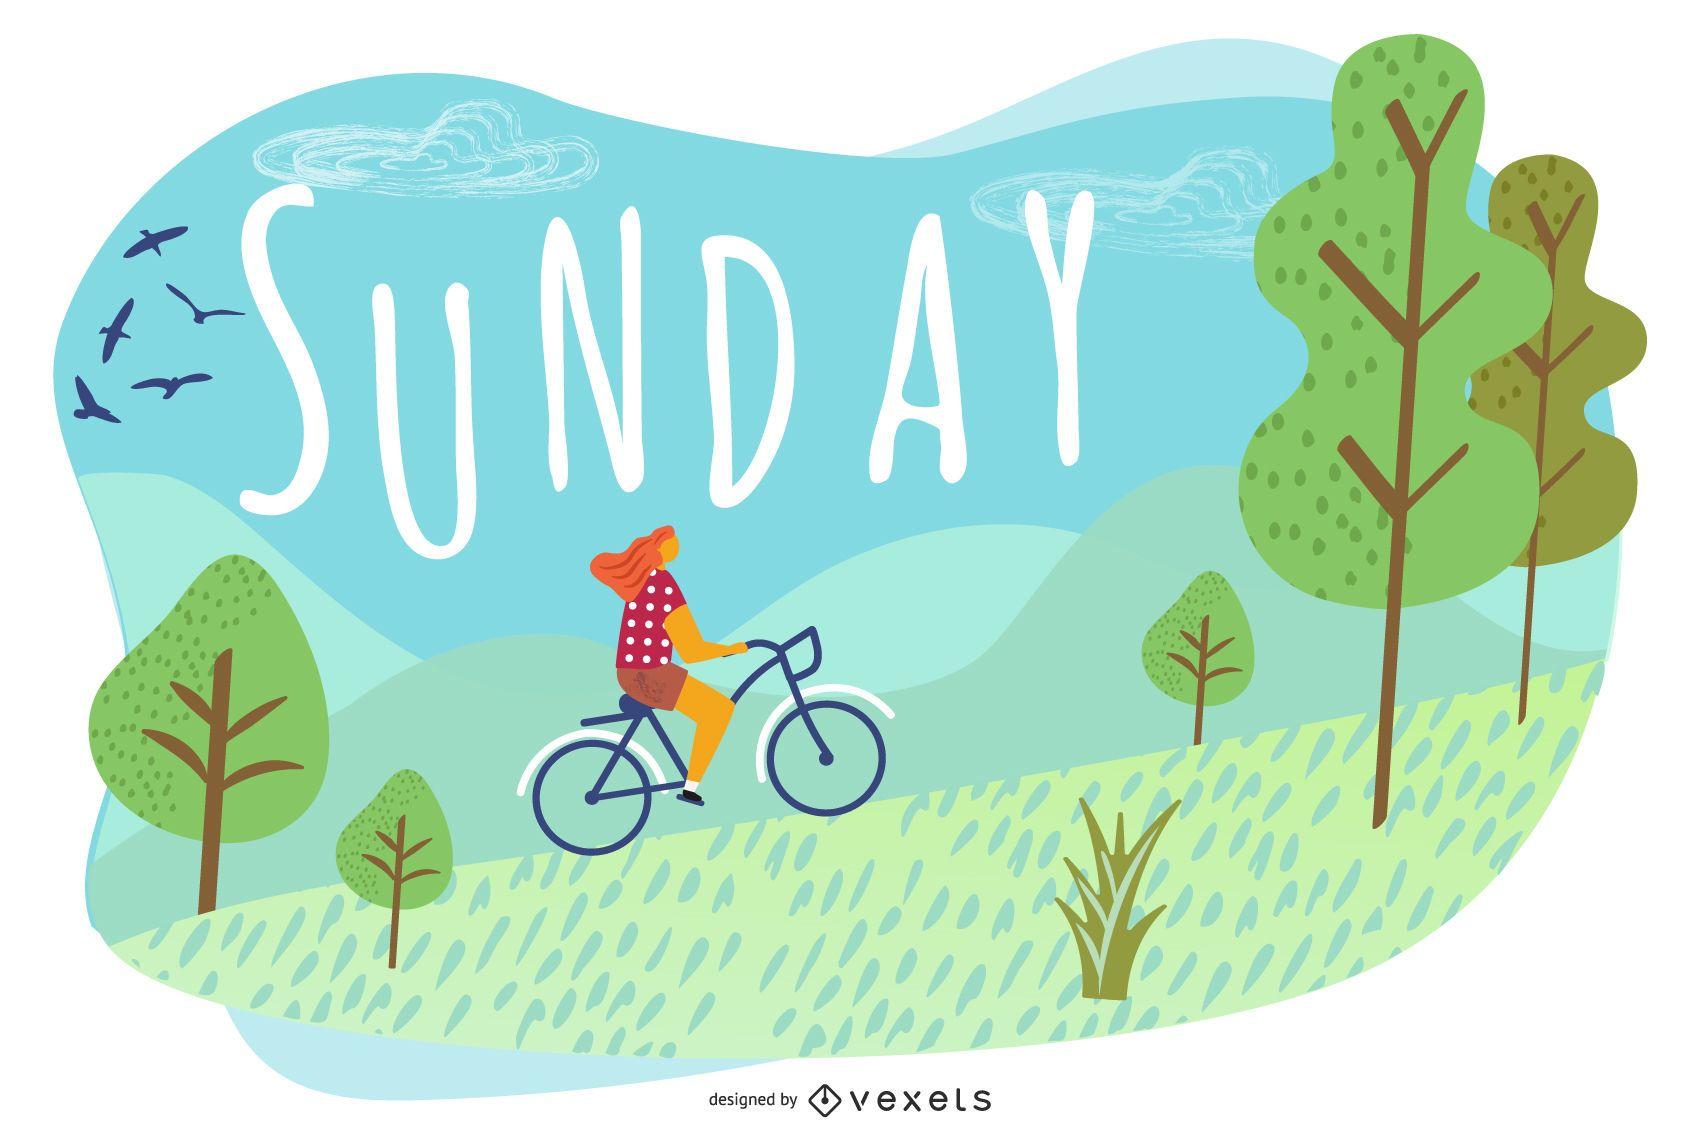 Sunday Cartoon Illustration Design